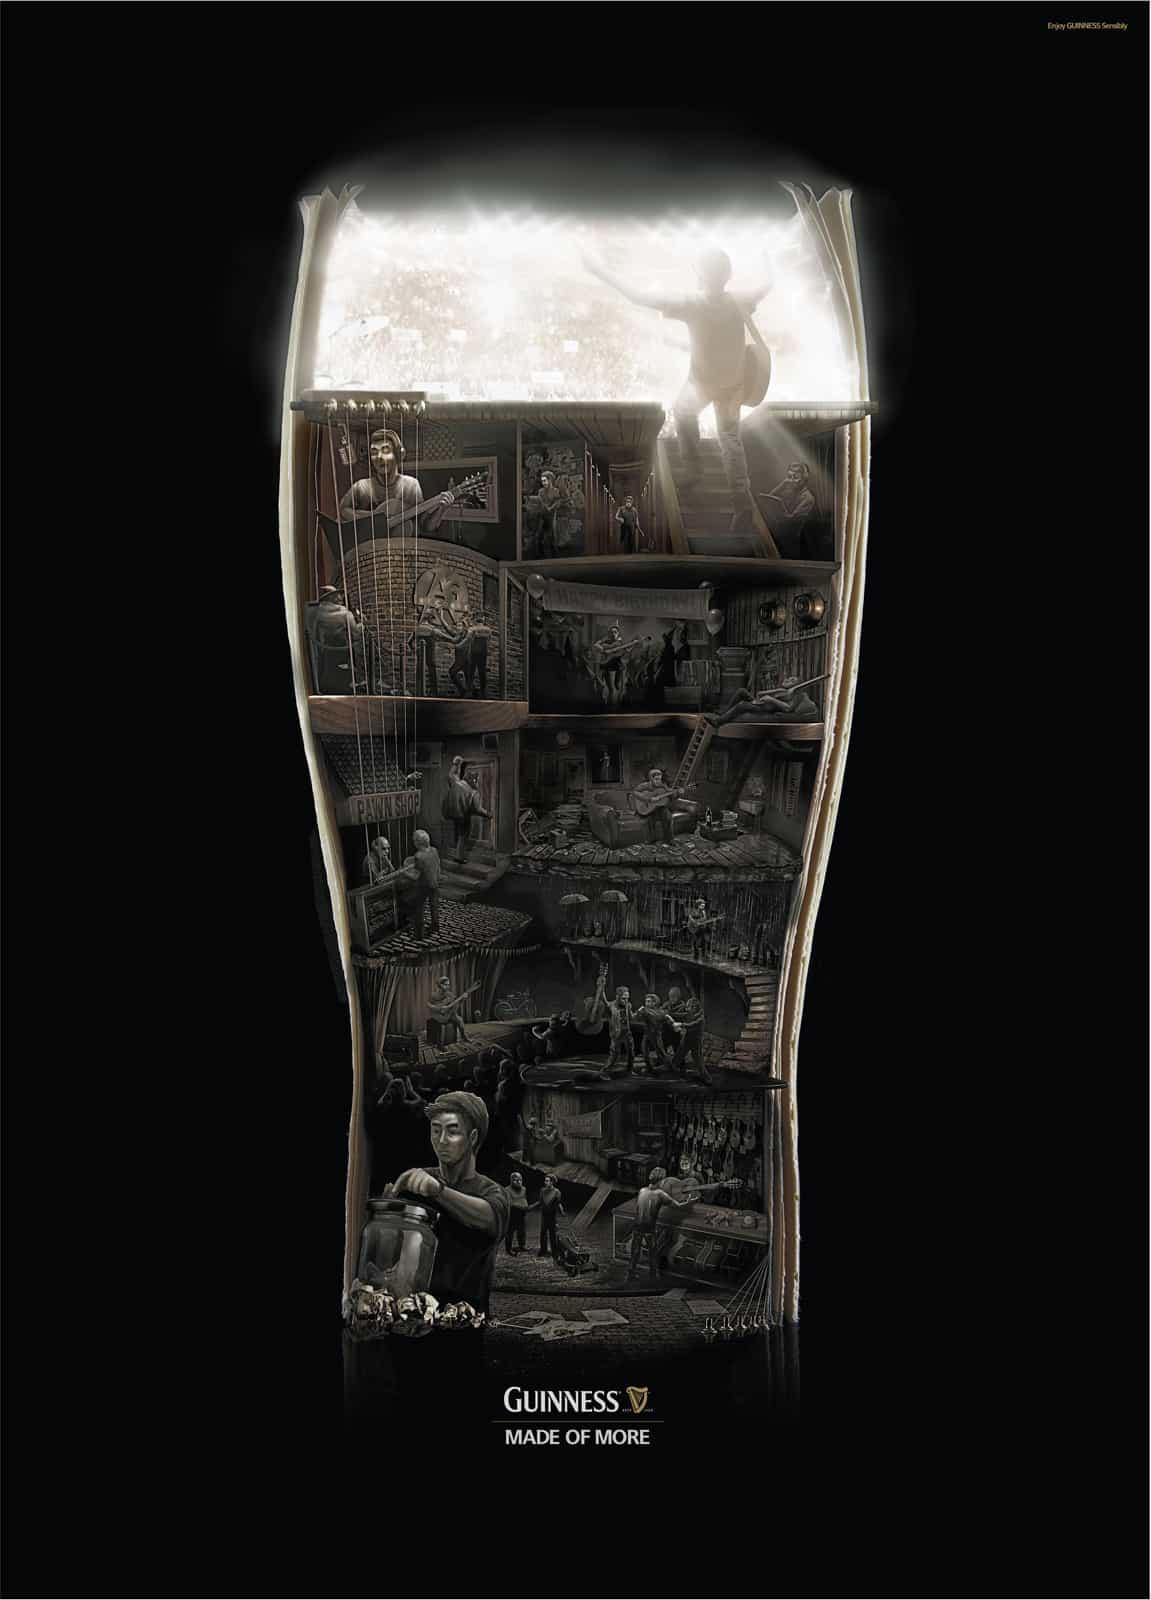 Pub Guinness : histoire